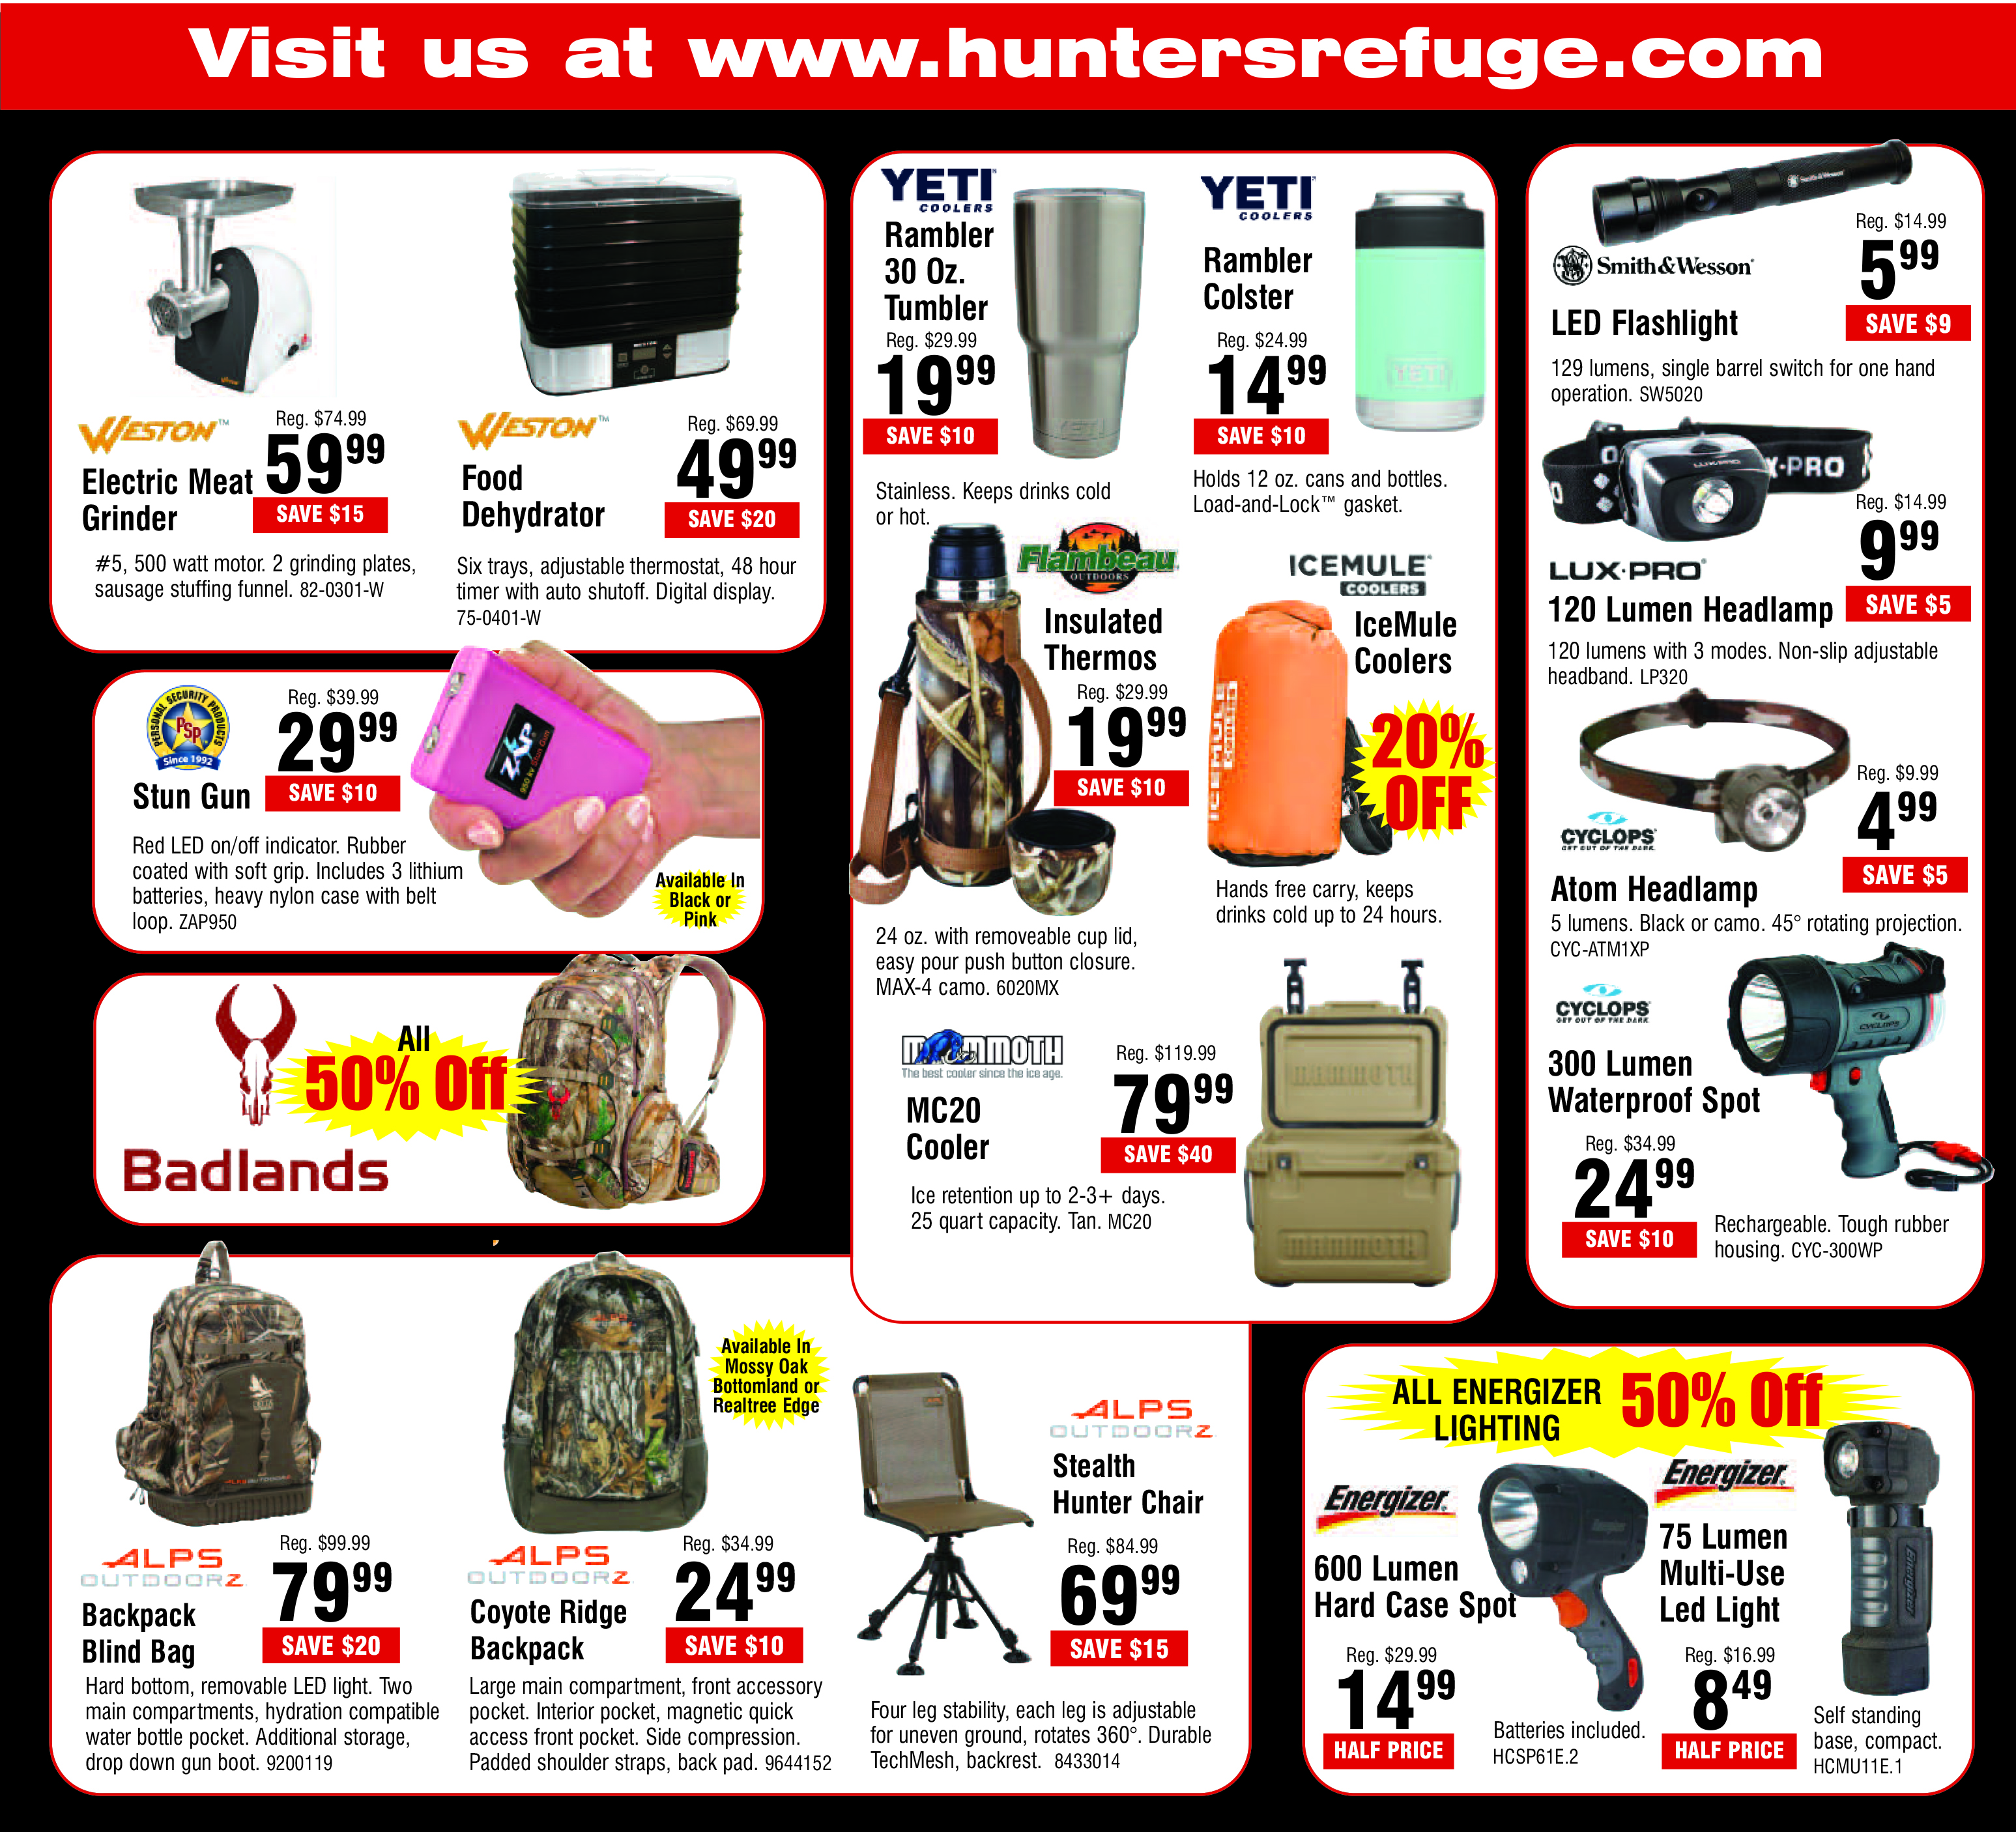 hunters-refuge-holiday-2018-6.jpg